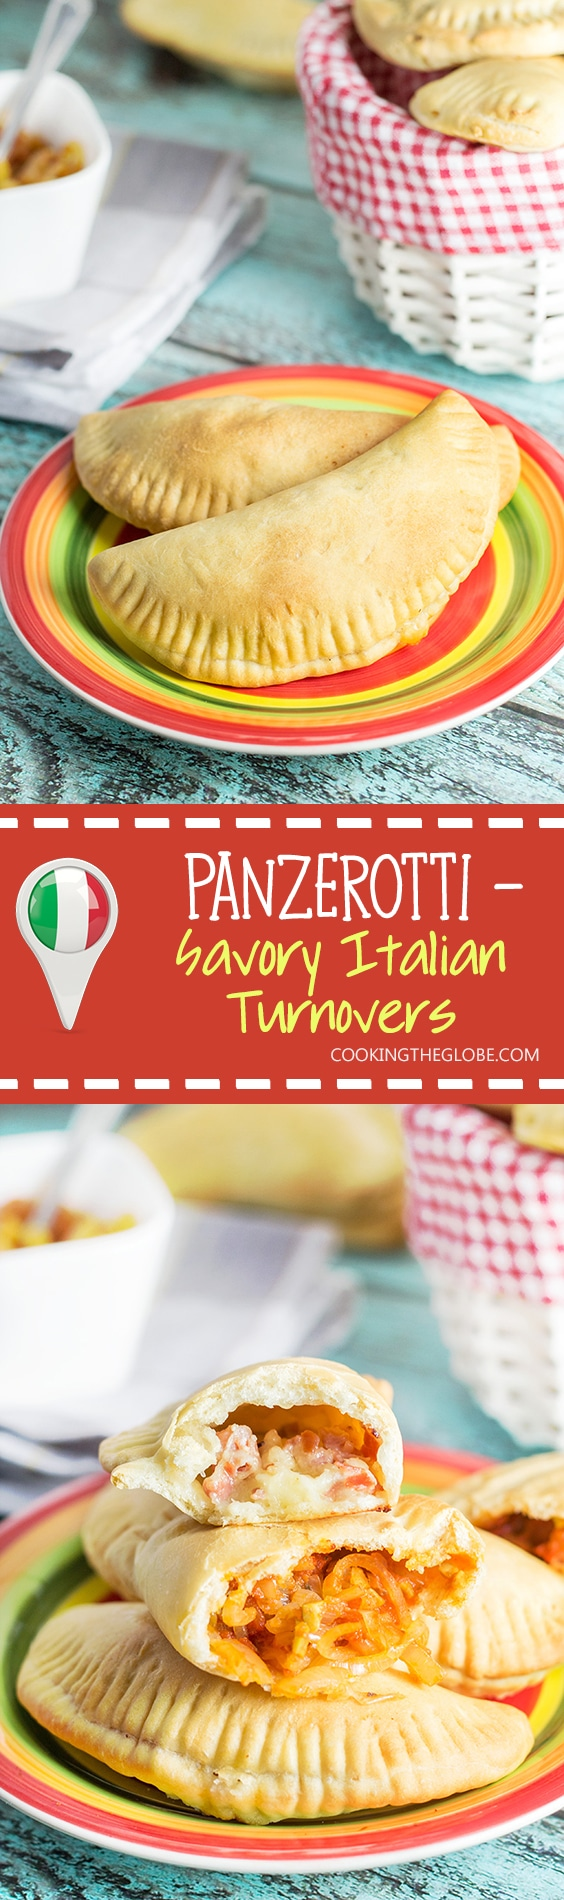 Panzerotti - savory Italian turnovers with mozzarella & prosciutto and onions & olives fillings!